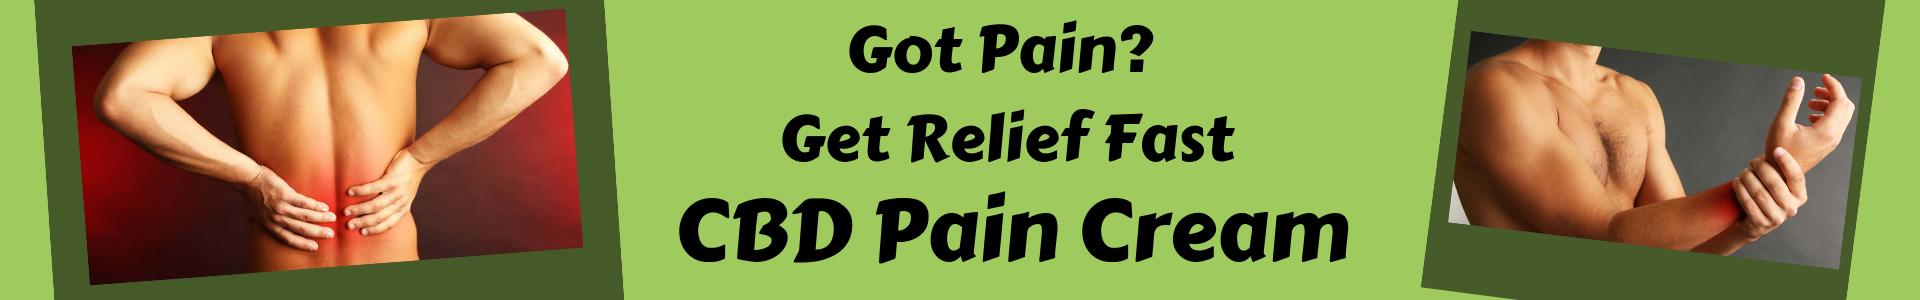 RTP-Medical-Massage-CBD-Pain-Cream